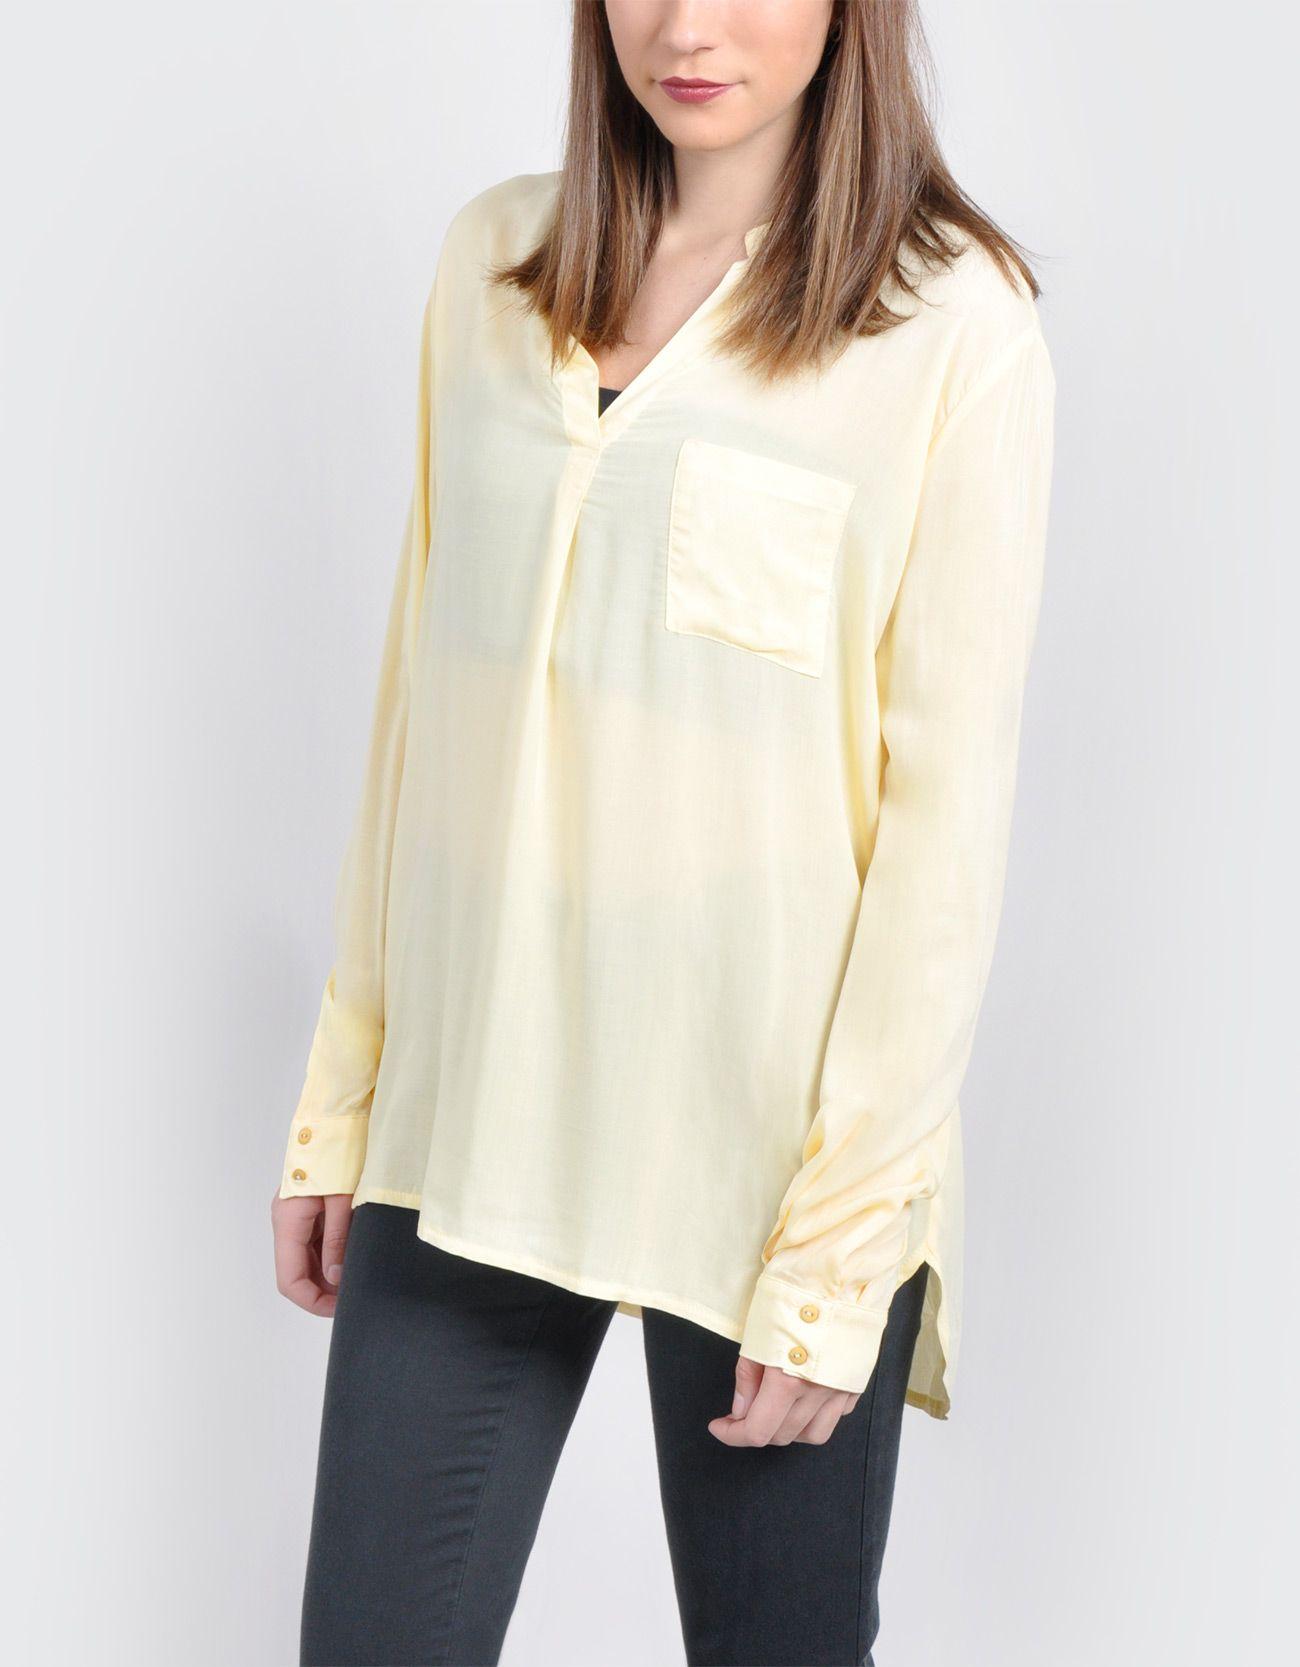 Blusa cuello mao bolsillo : CHICA Blusas & Camisas